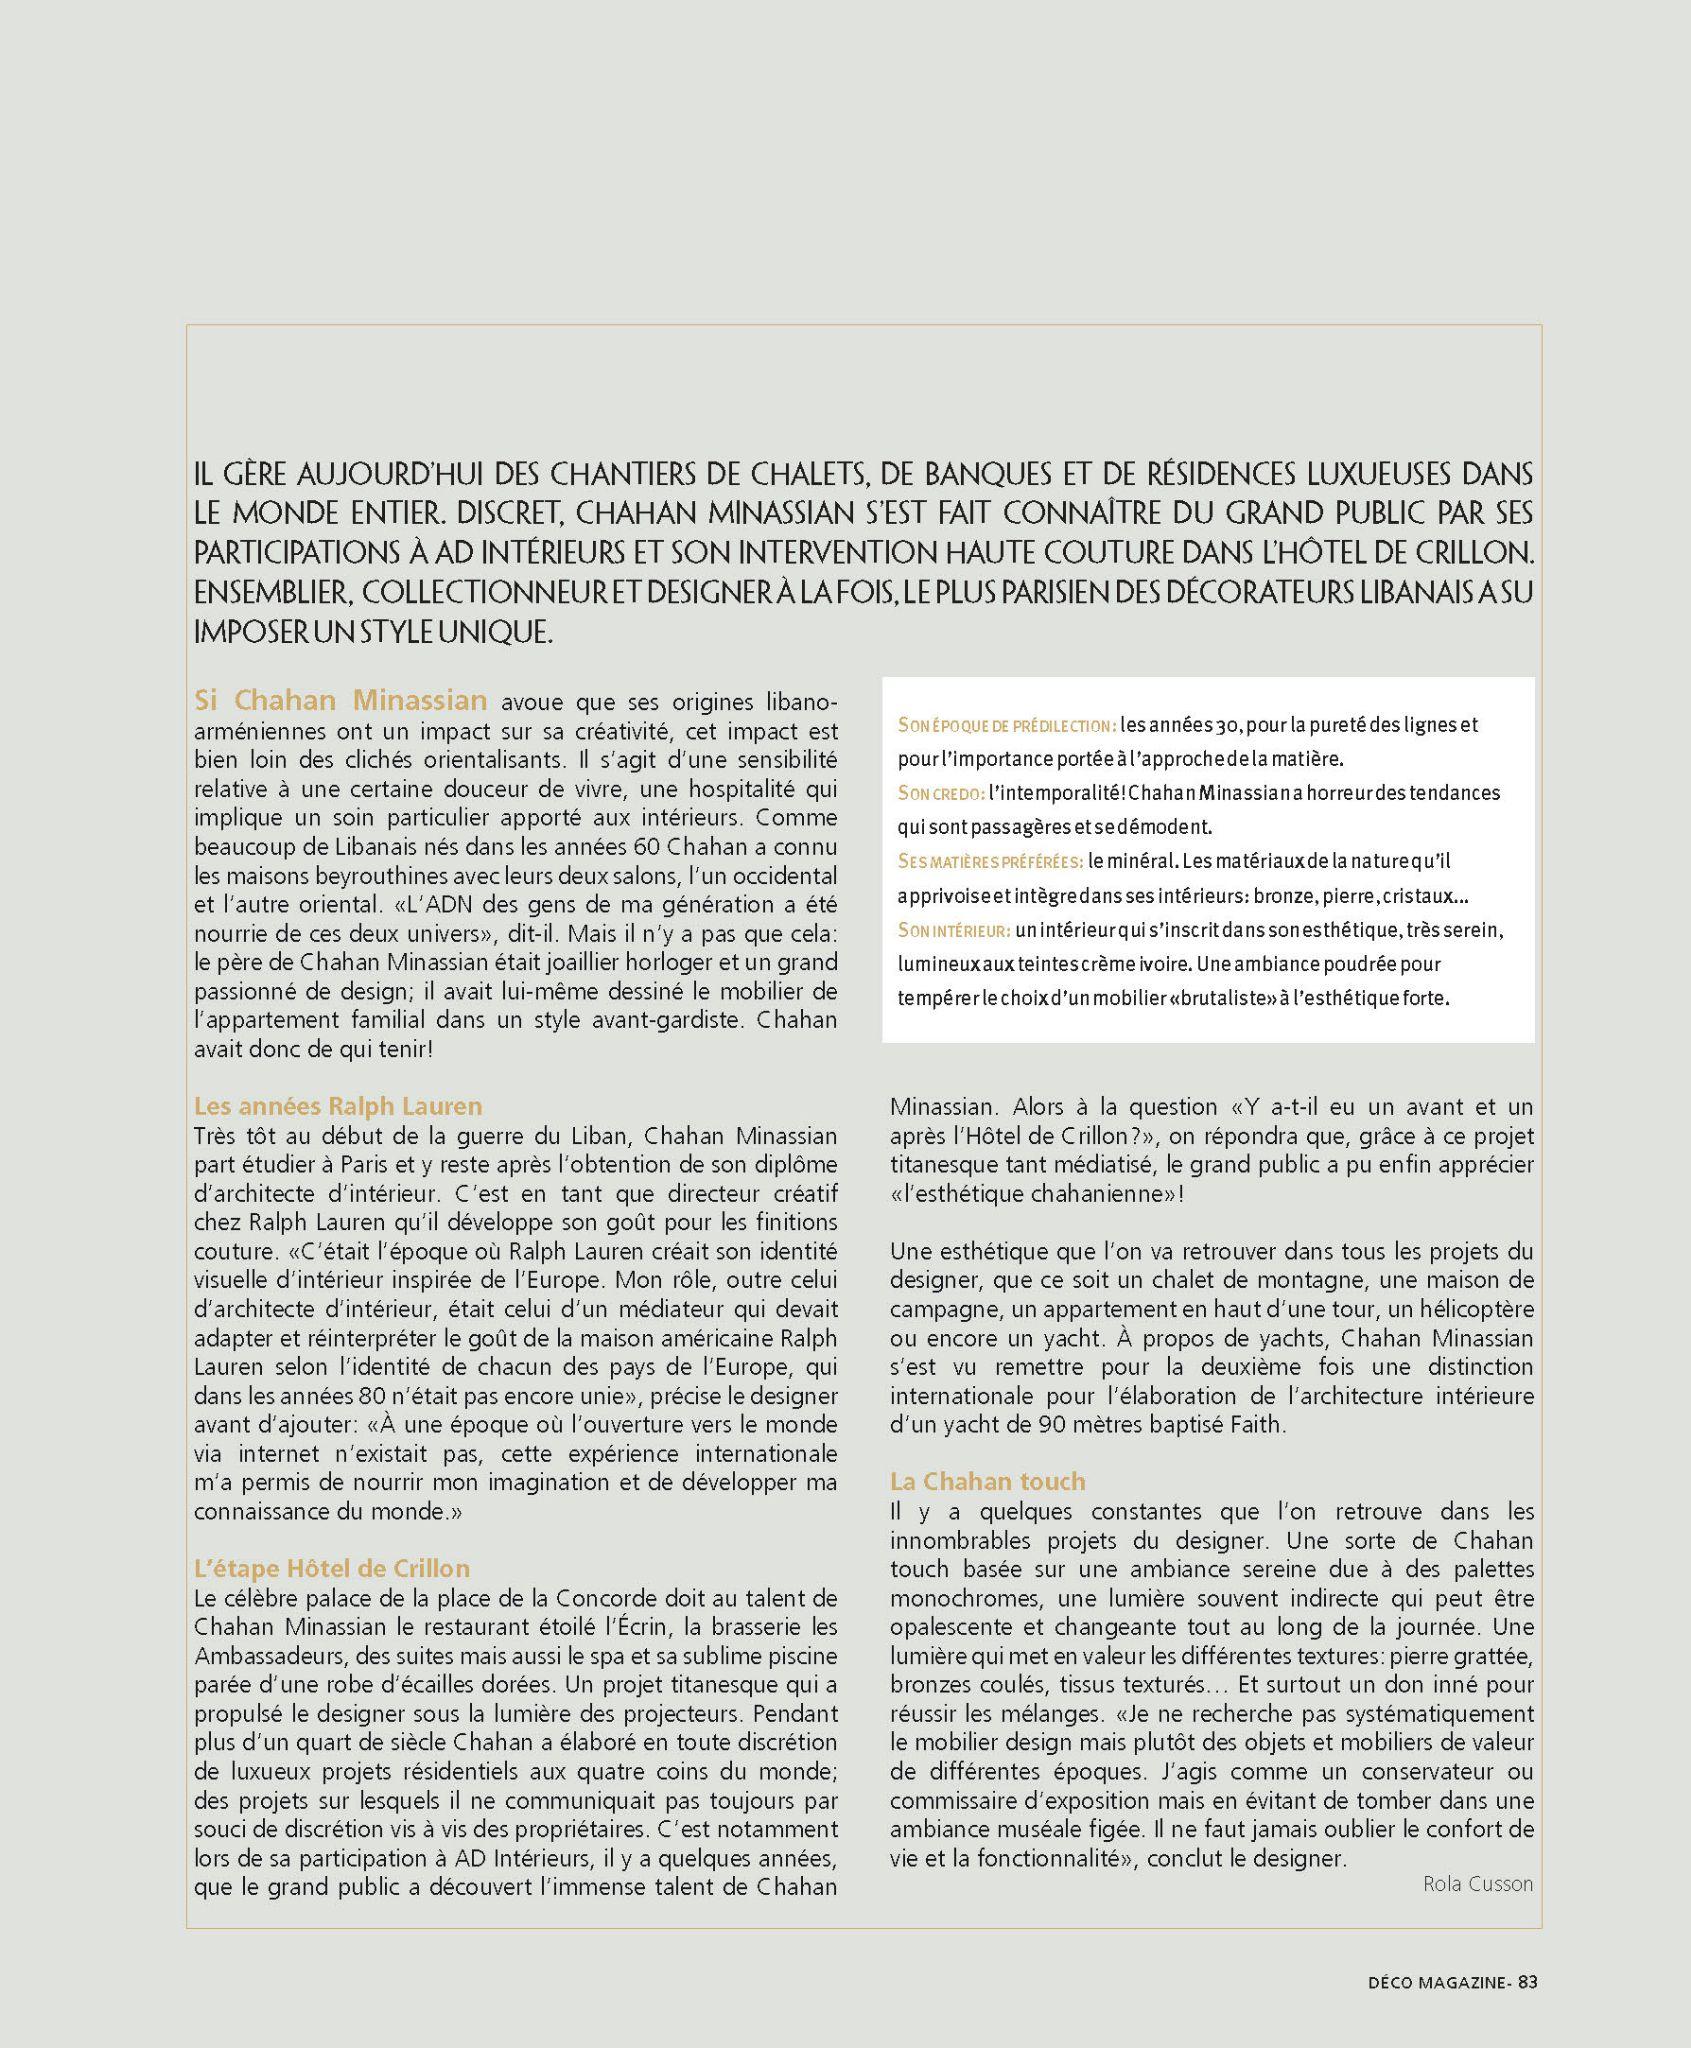 chahan-gallery-deco-magazine-18-2-1